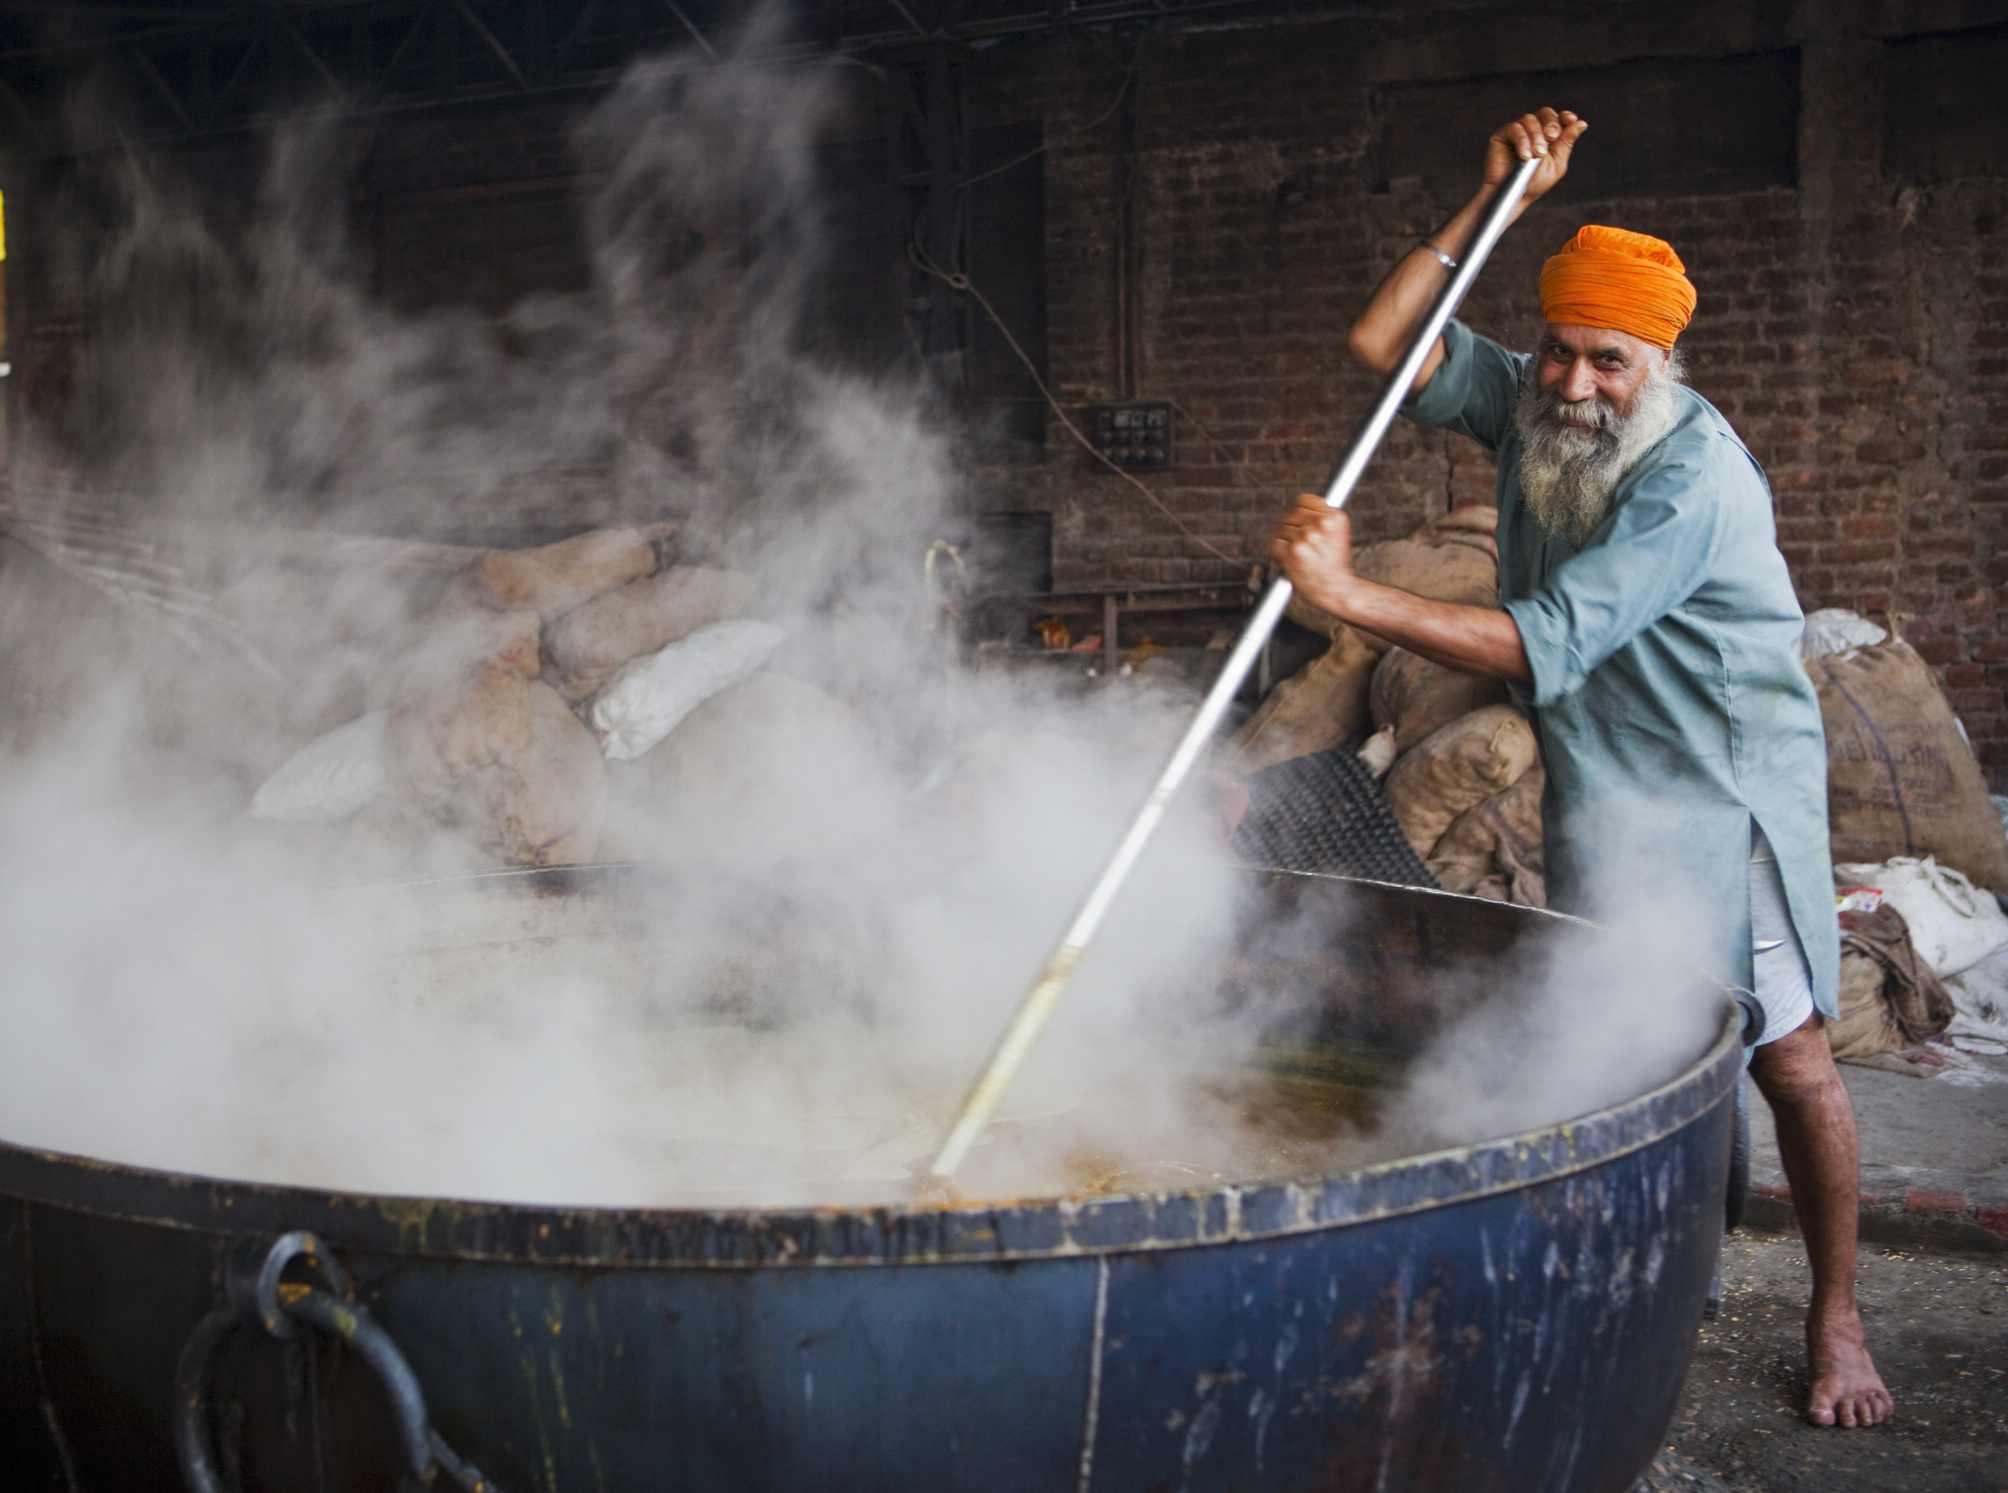 Volunteer cook at Langar (Community kitchen) at Darbar Sahib or Golden Temple